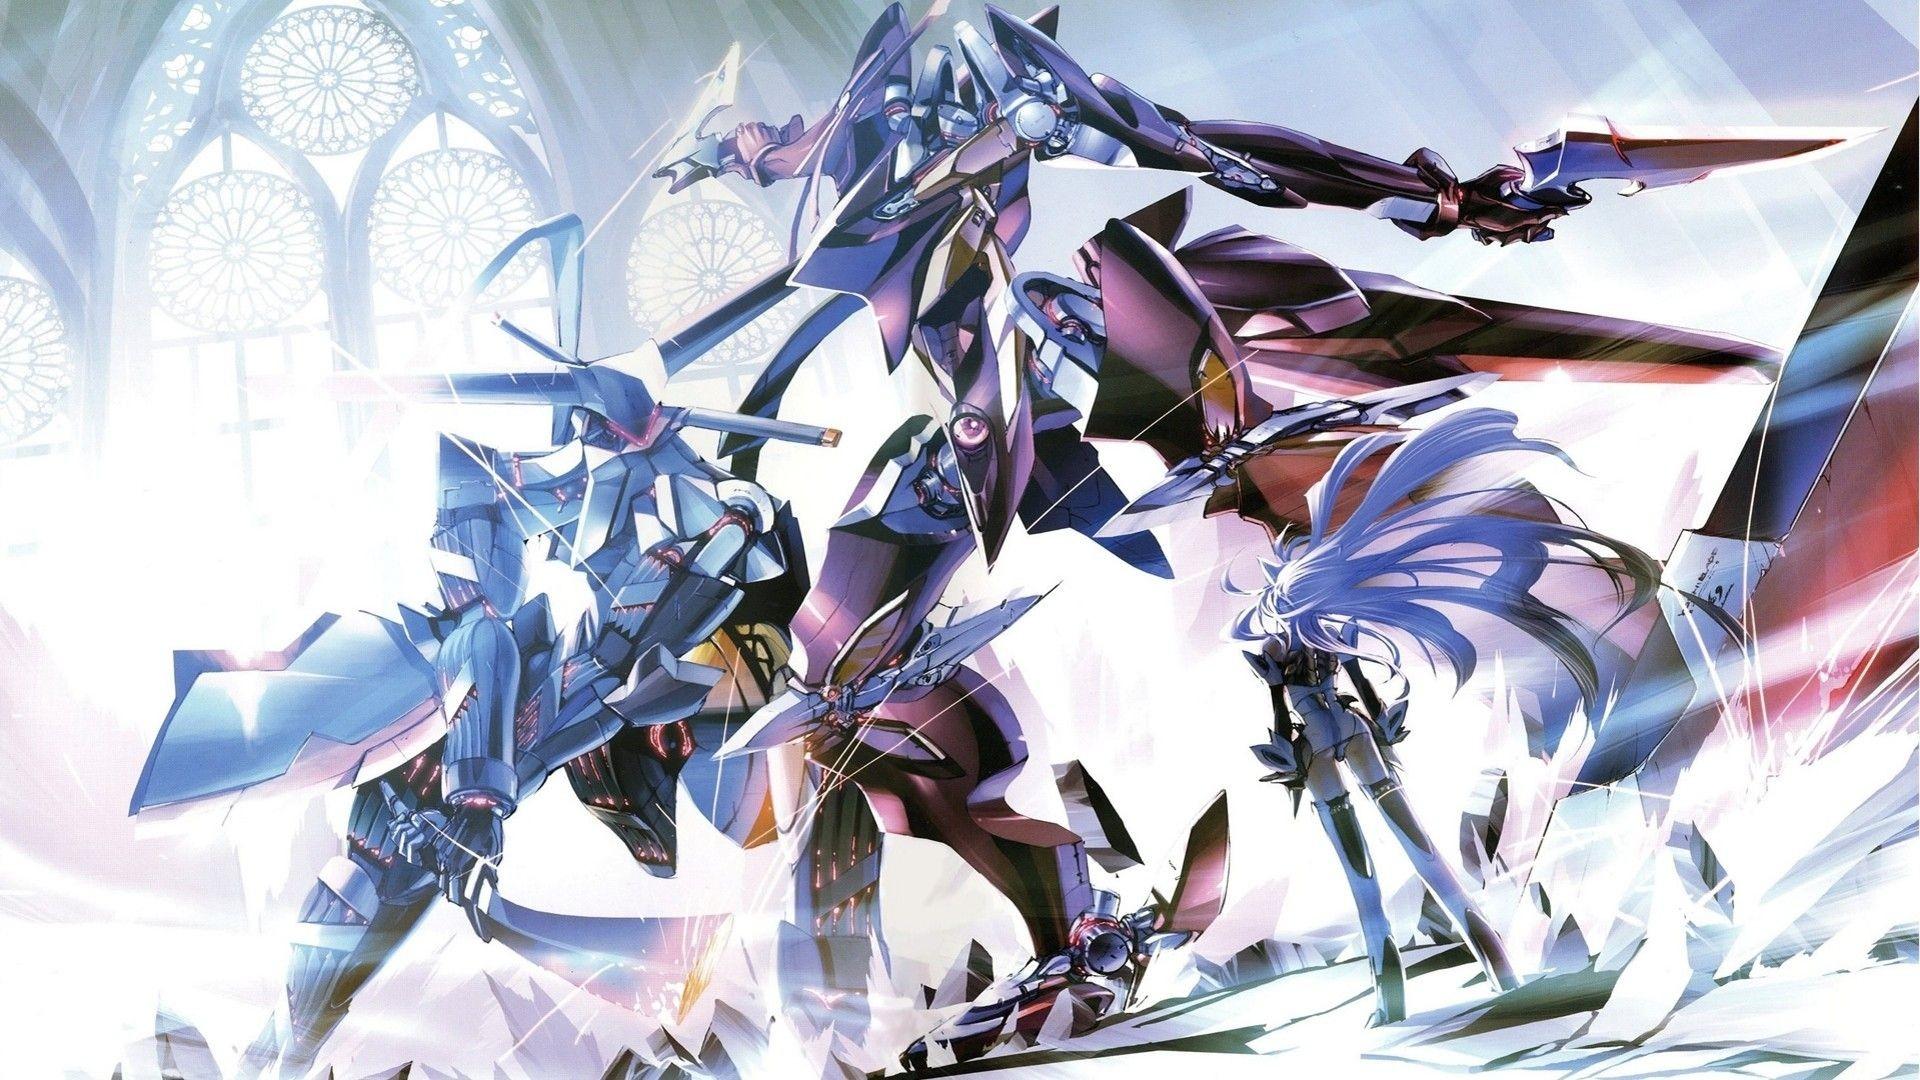 Unduh 100 Wallpaper Anime Mecha Hd